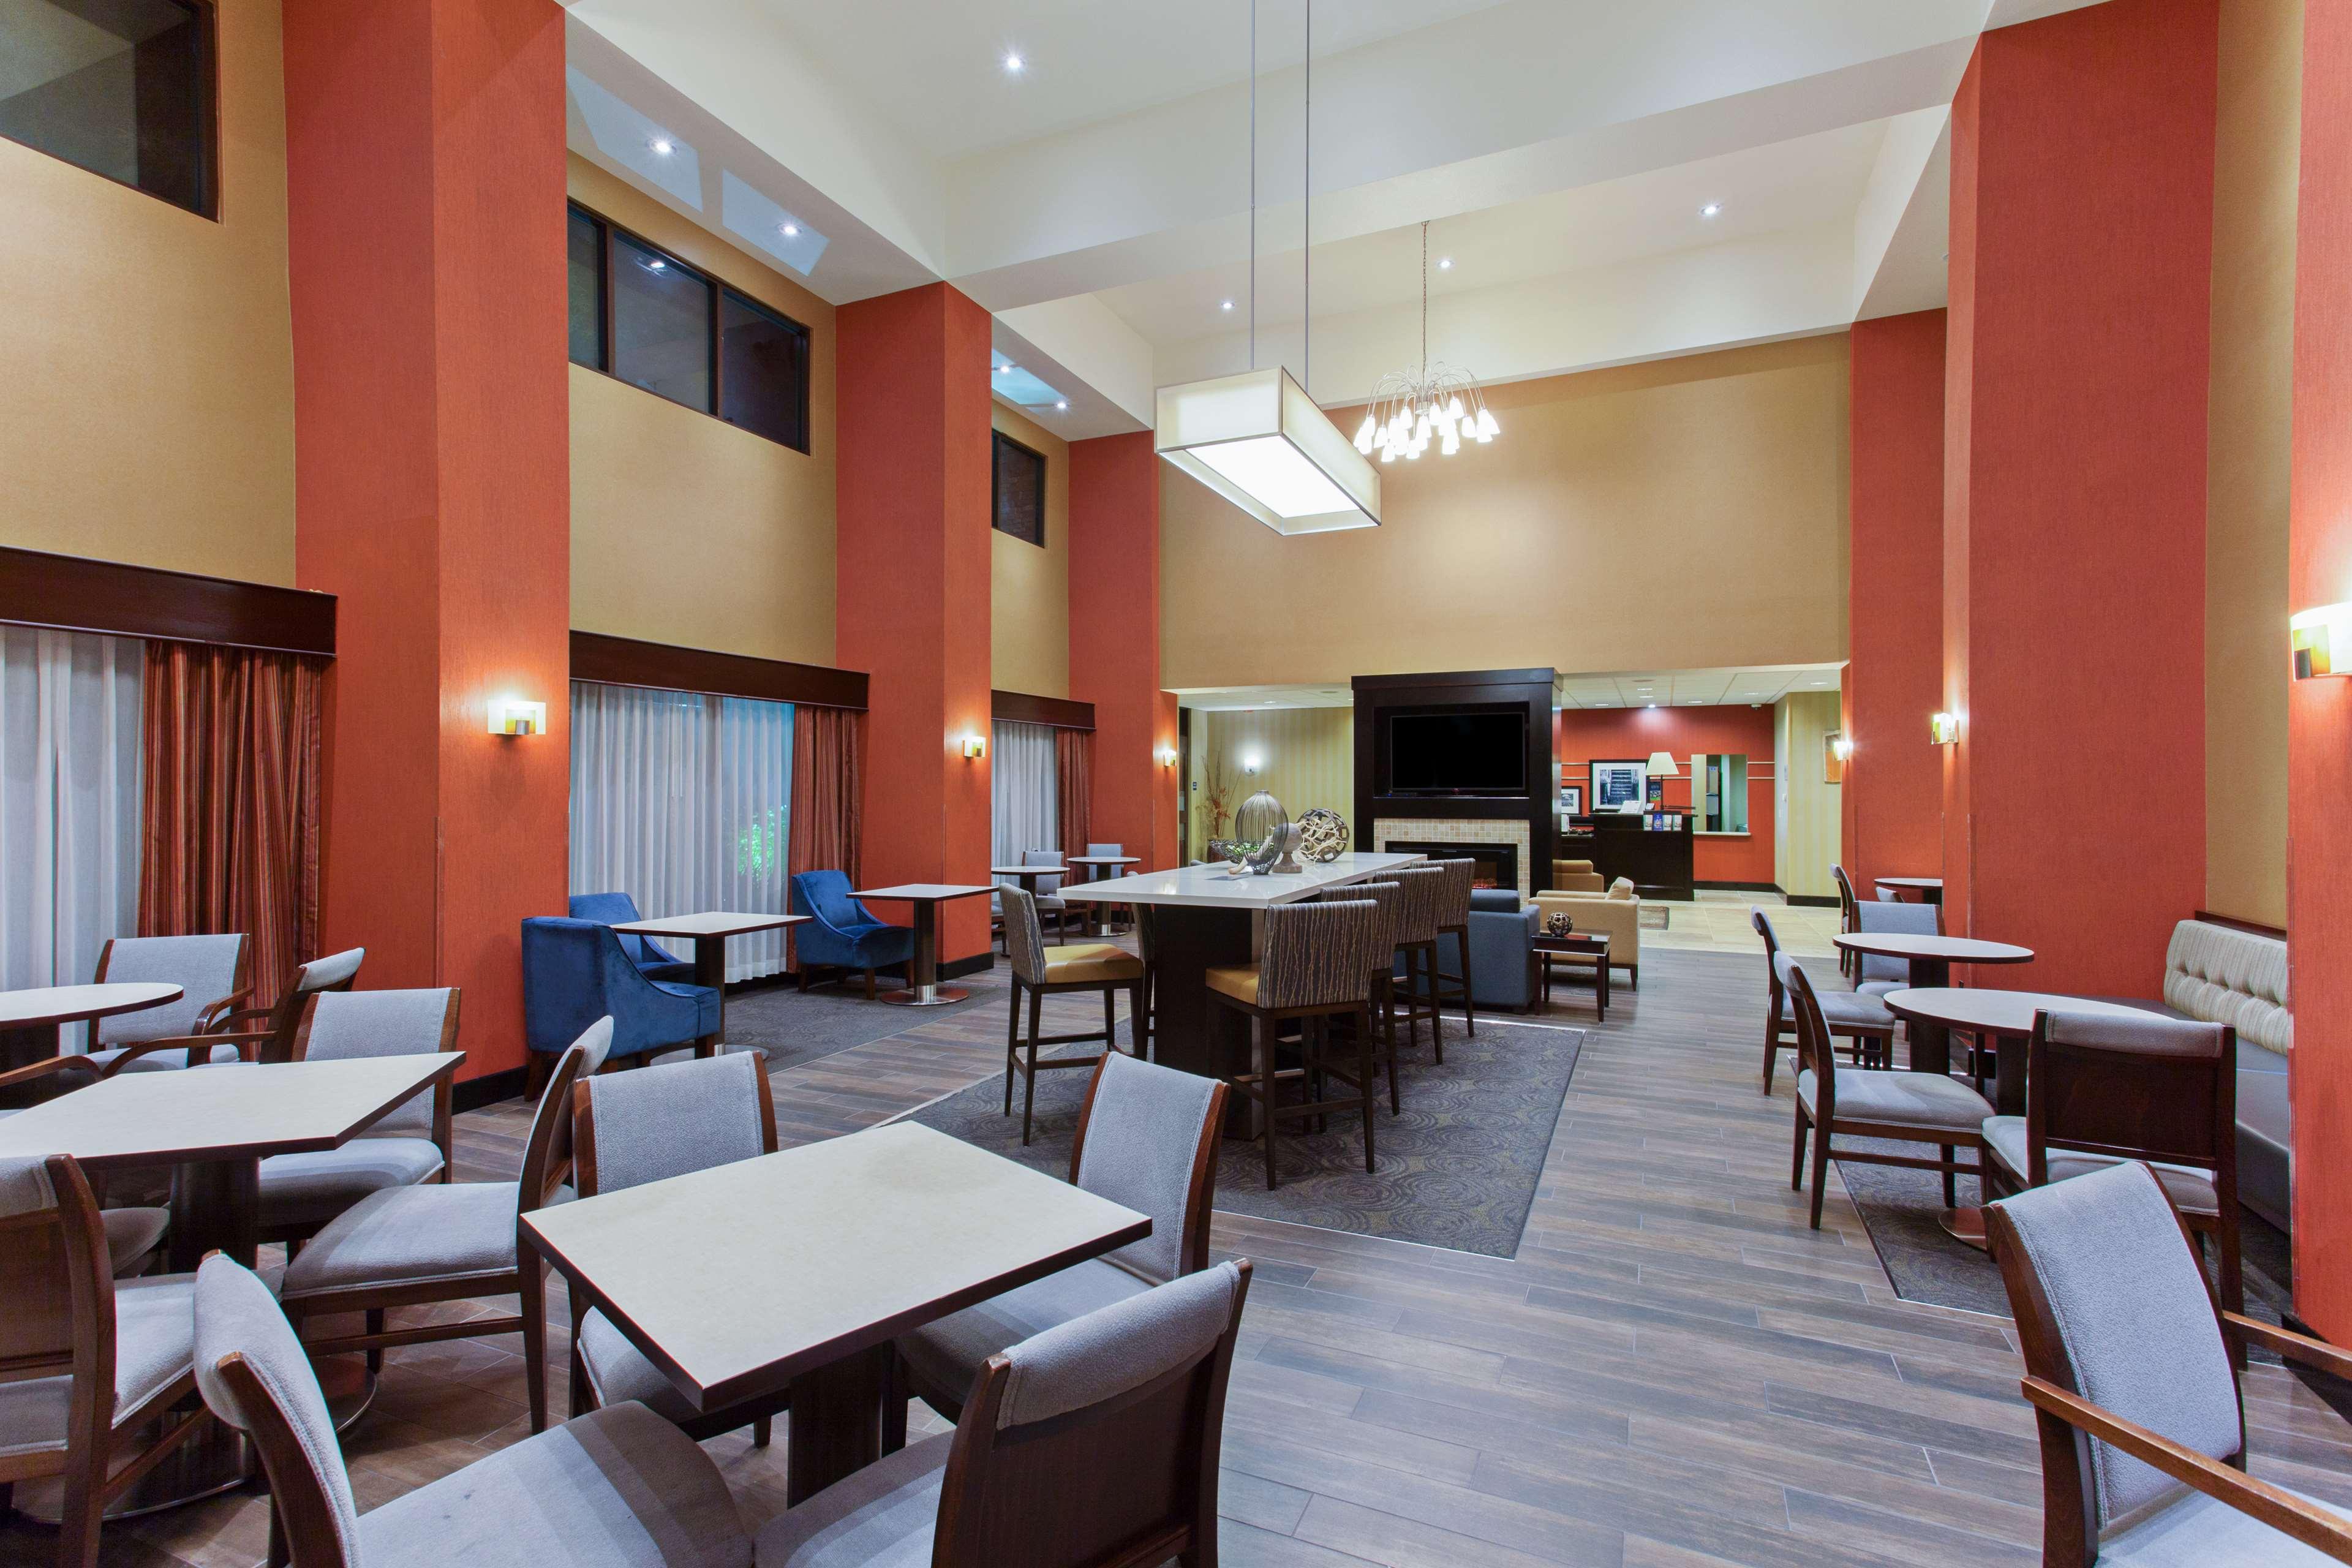 Hampton Inn & Suites Roseville image 5